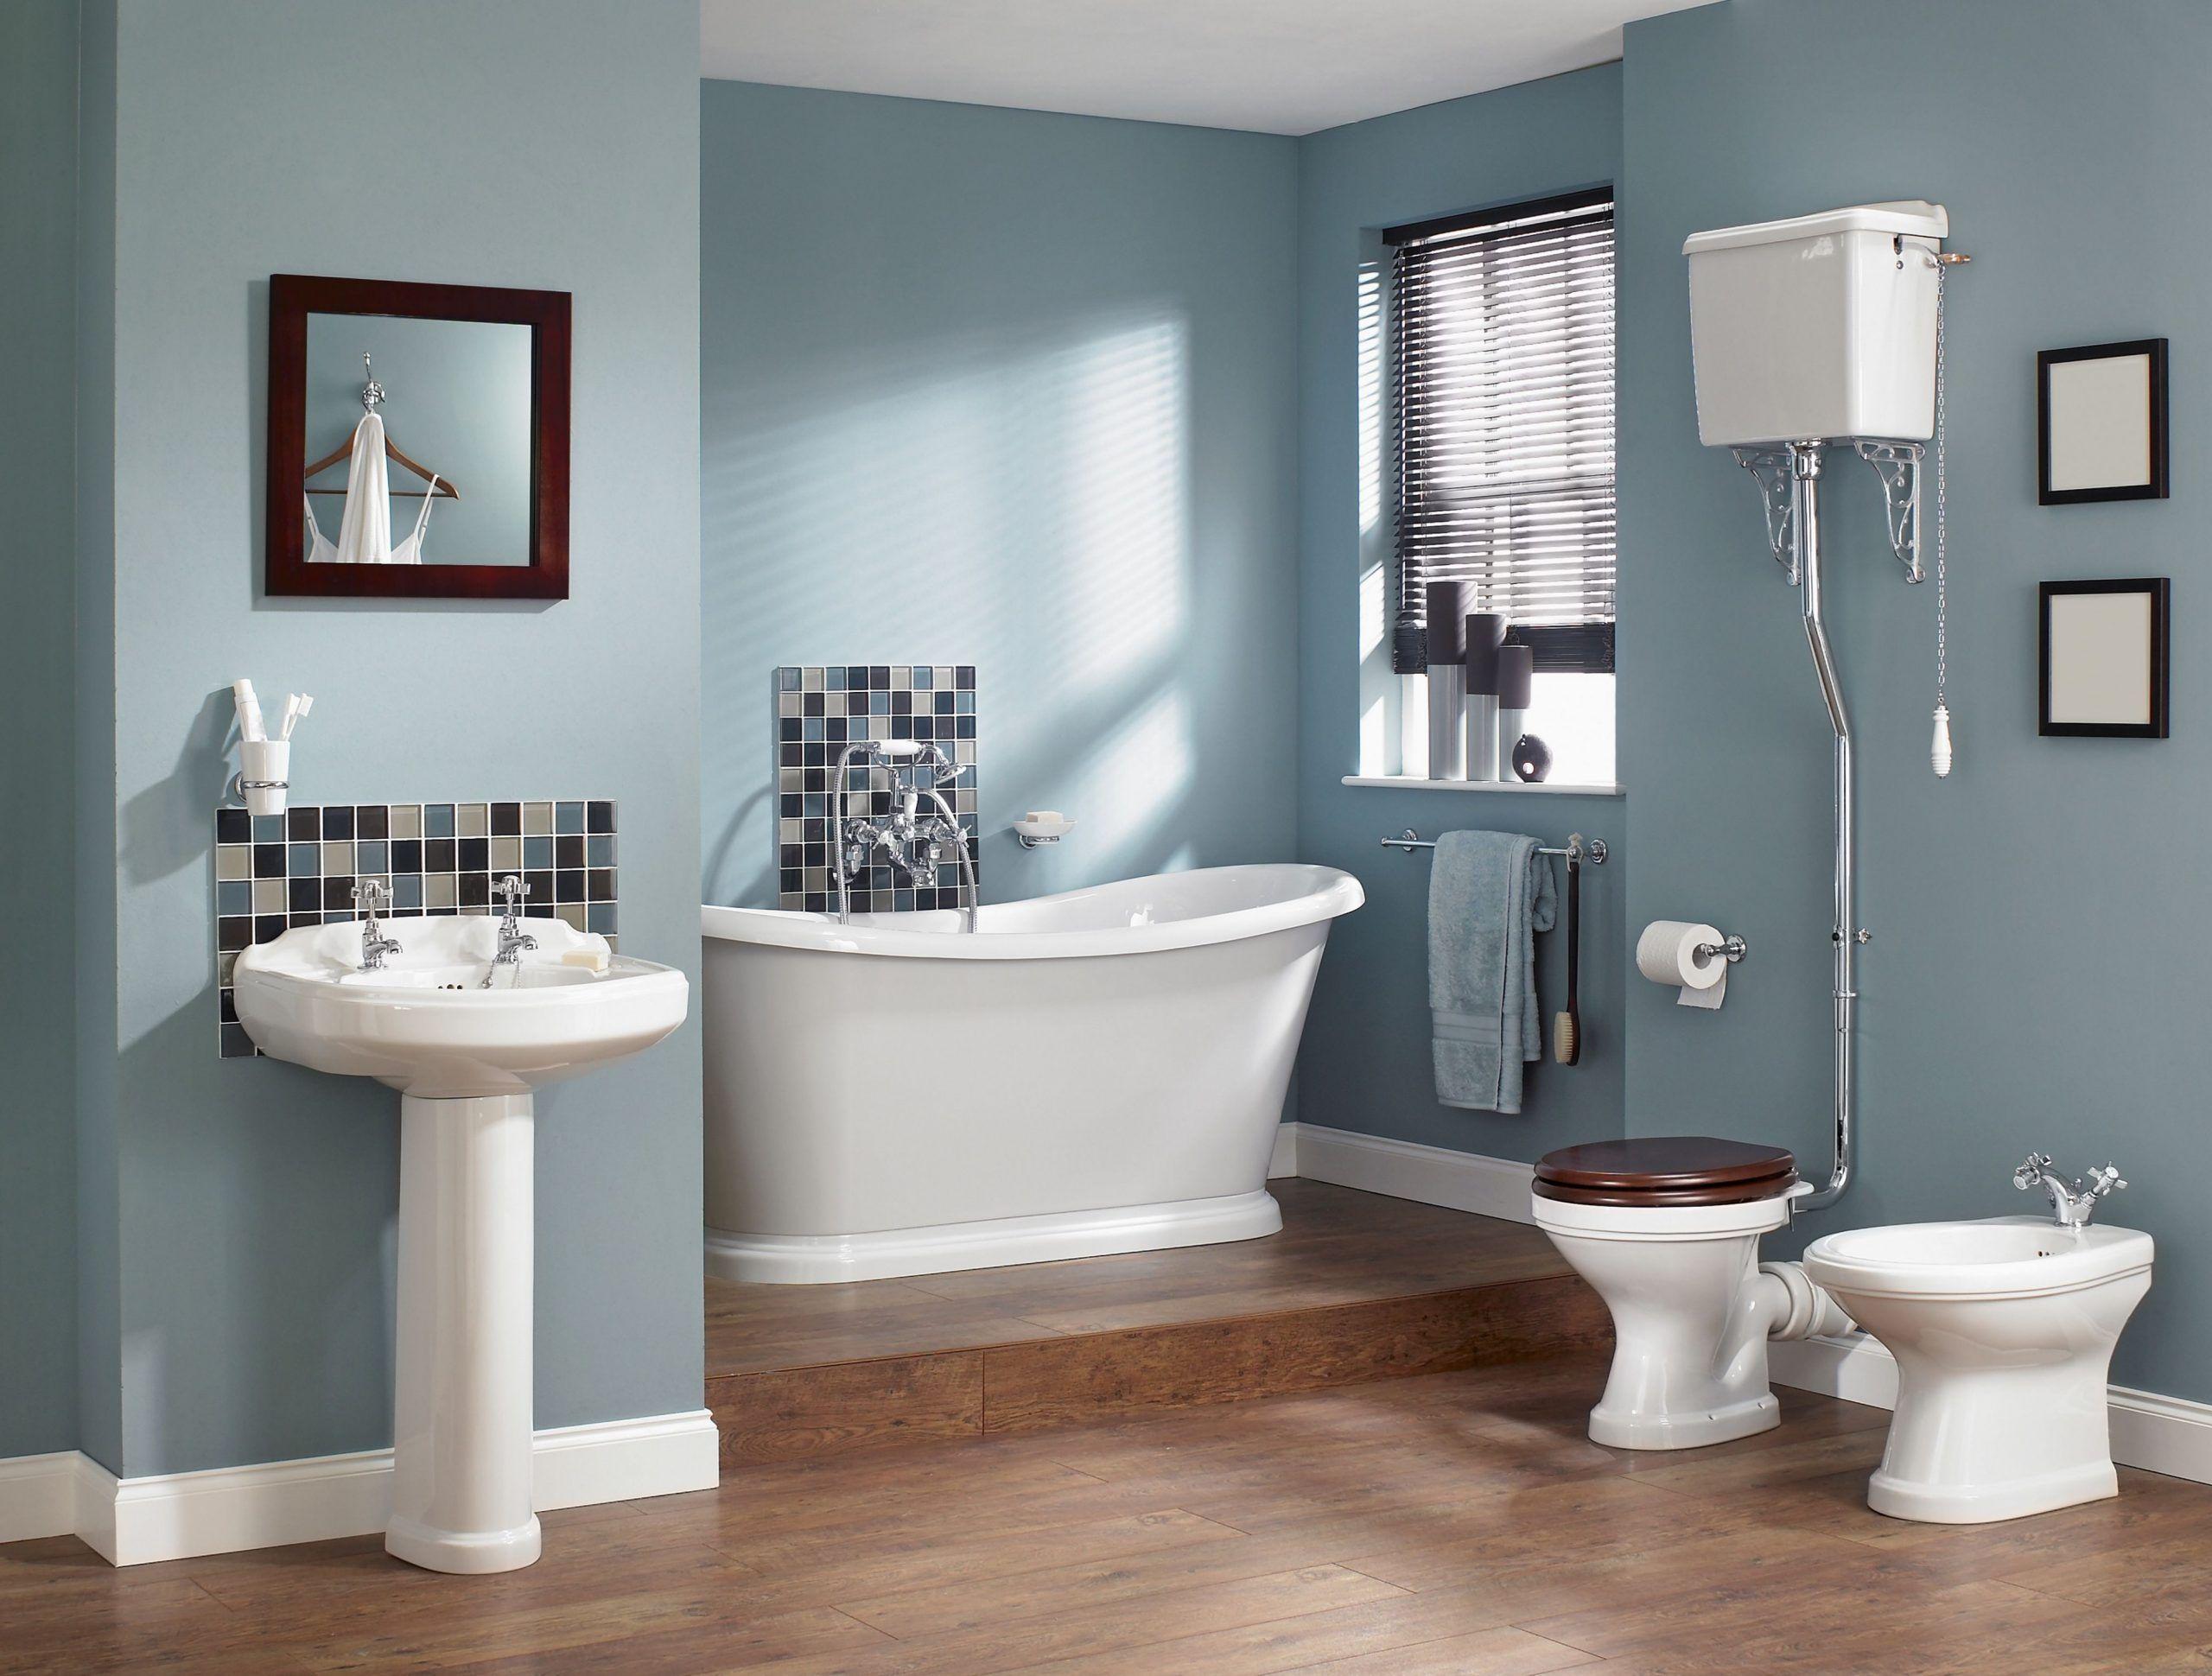 Ocean Blue Bathroom Ideas Bathroom Colors Blue Bathroom Color Schemes Best Bathroom Colors